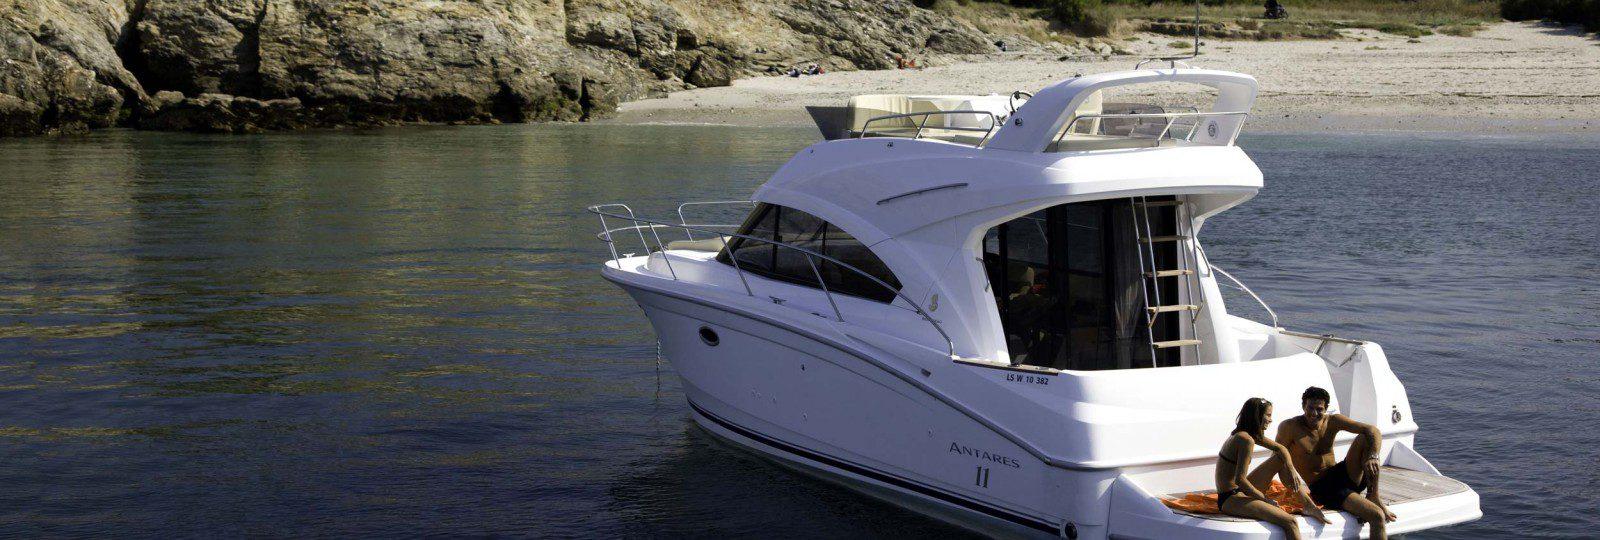 Beneteau Antares 36 at anchor